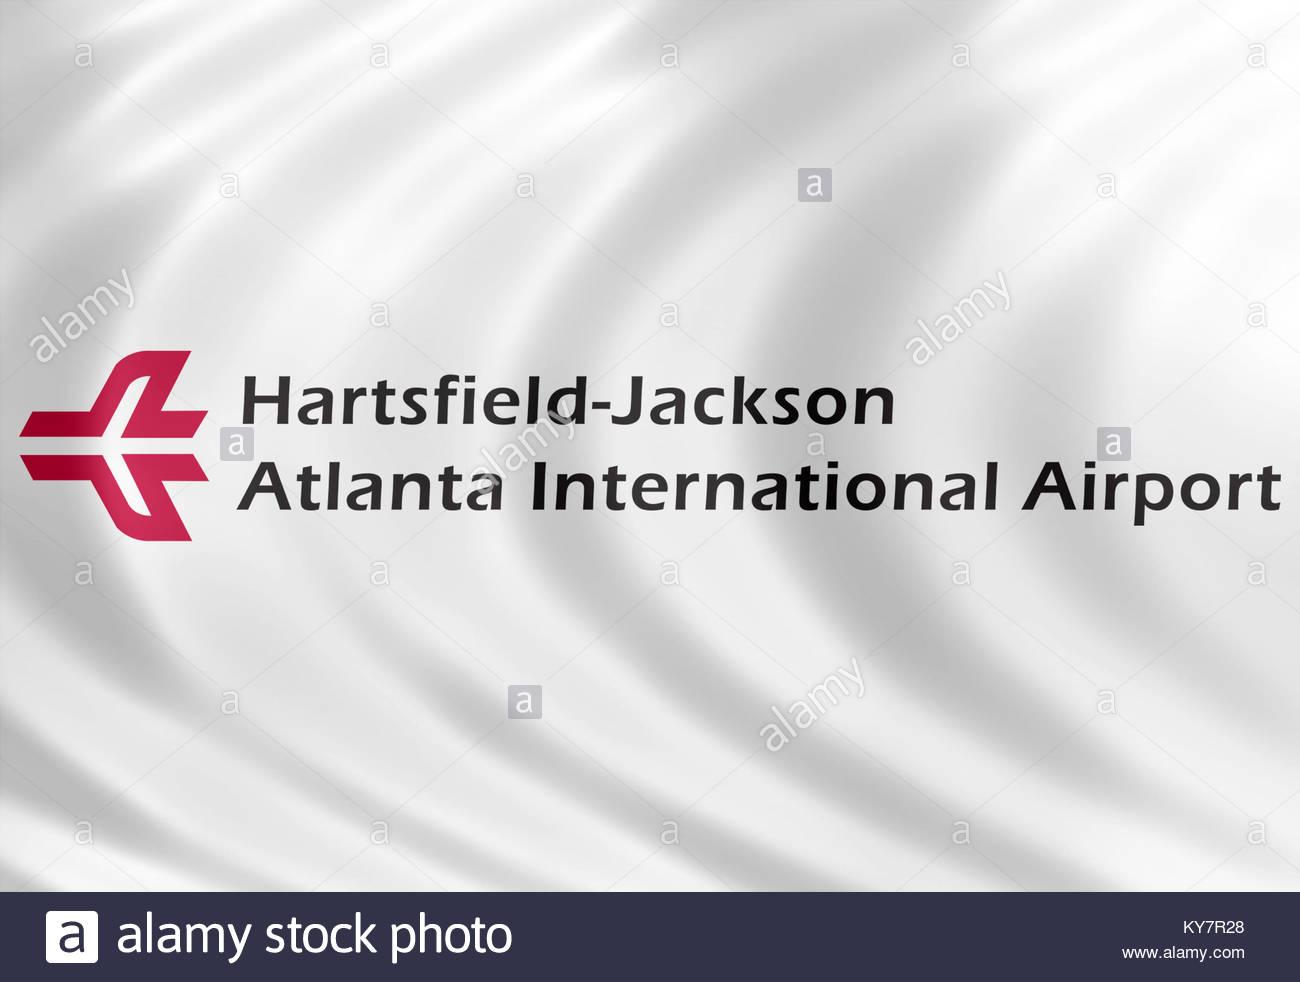 Hartsfield Jackson Atlanta International Airport icon logo - Stock Image